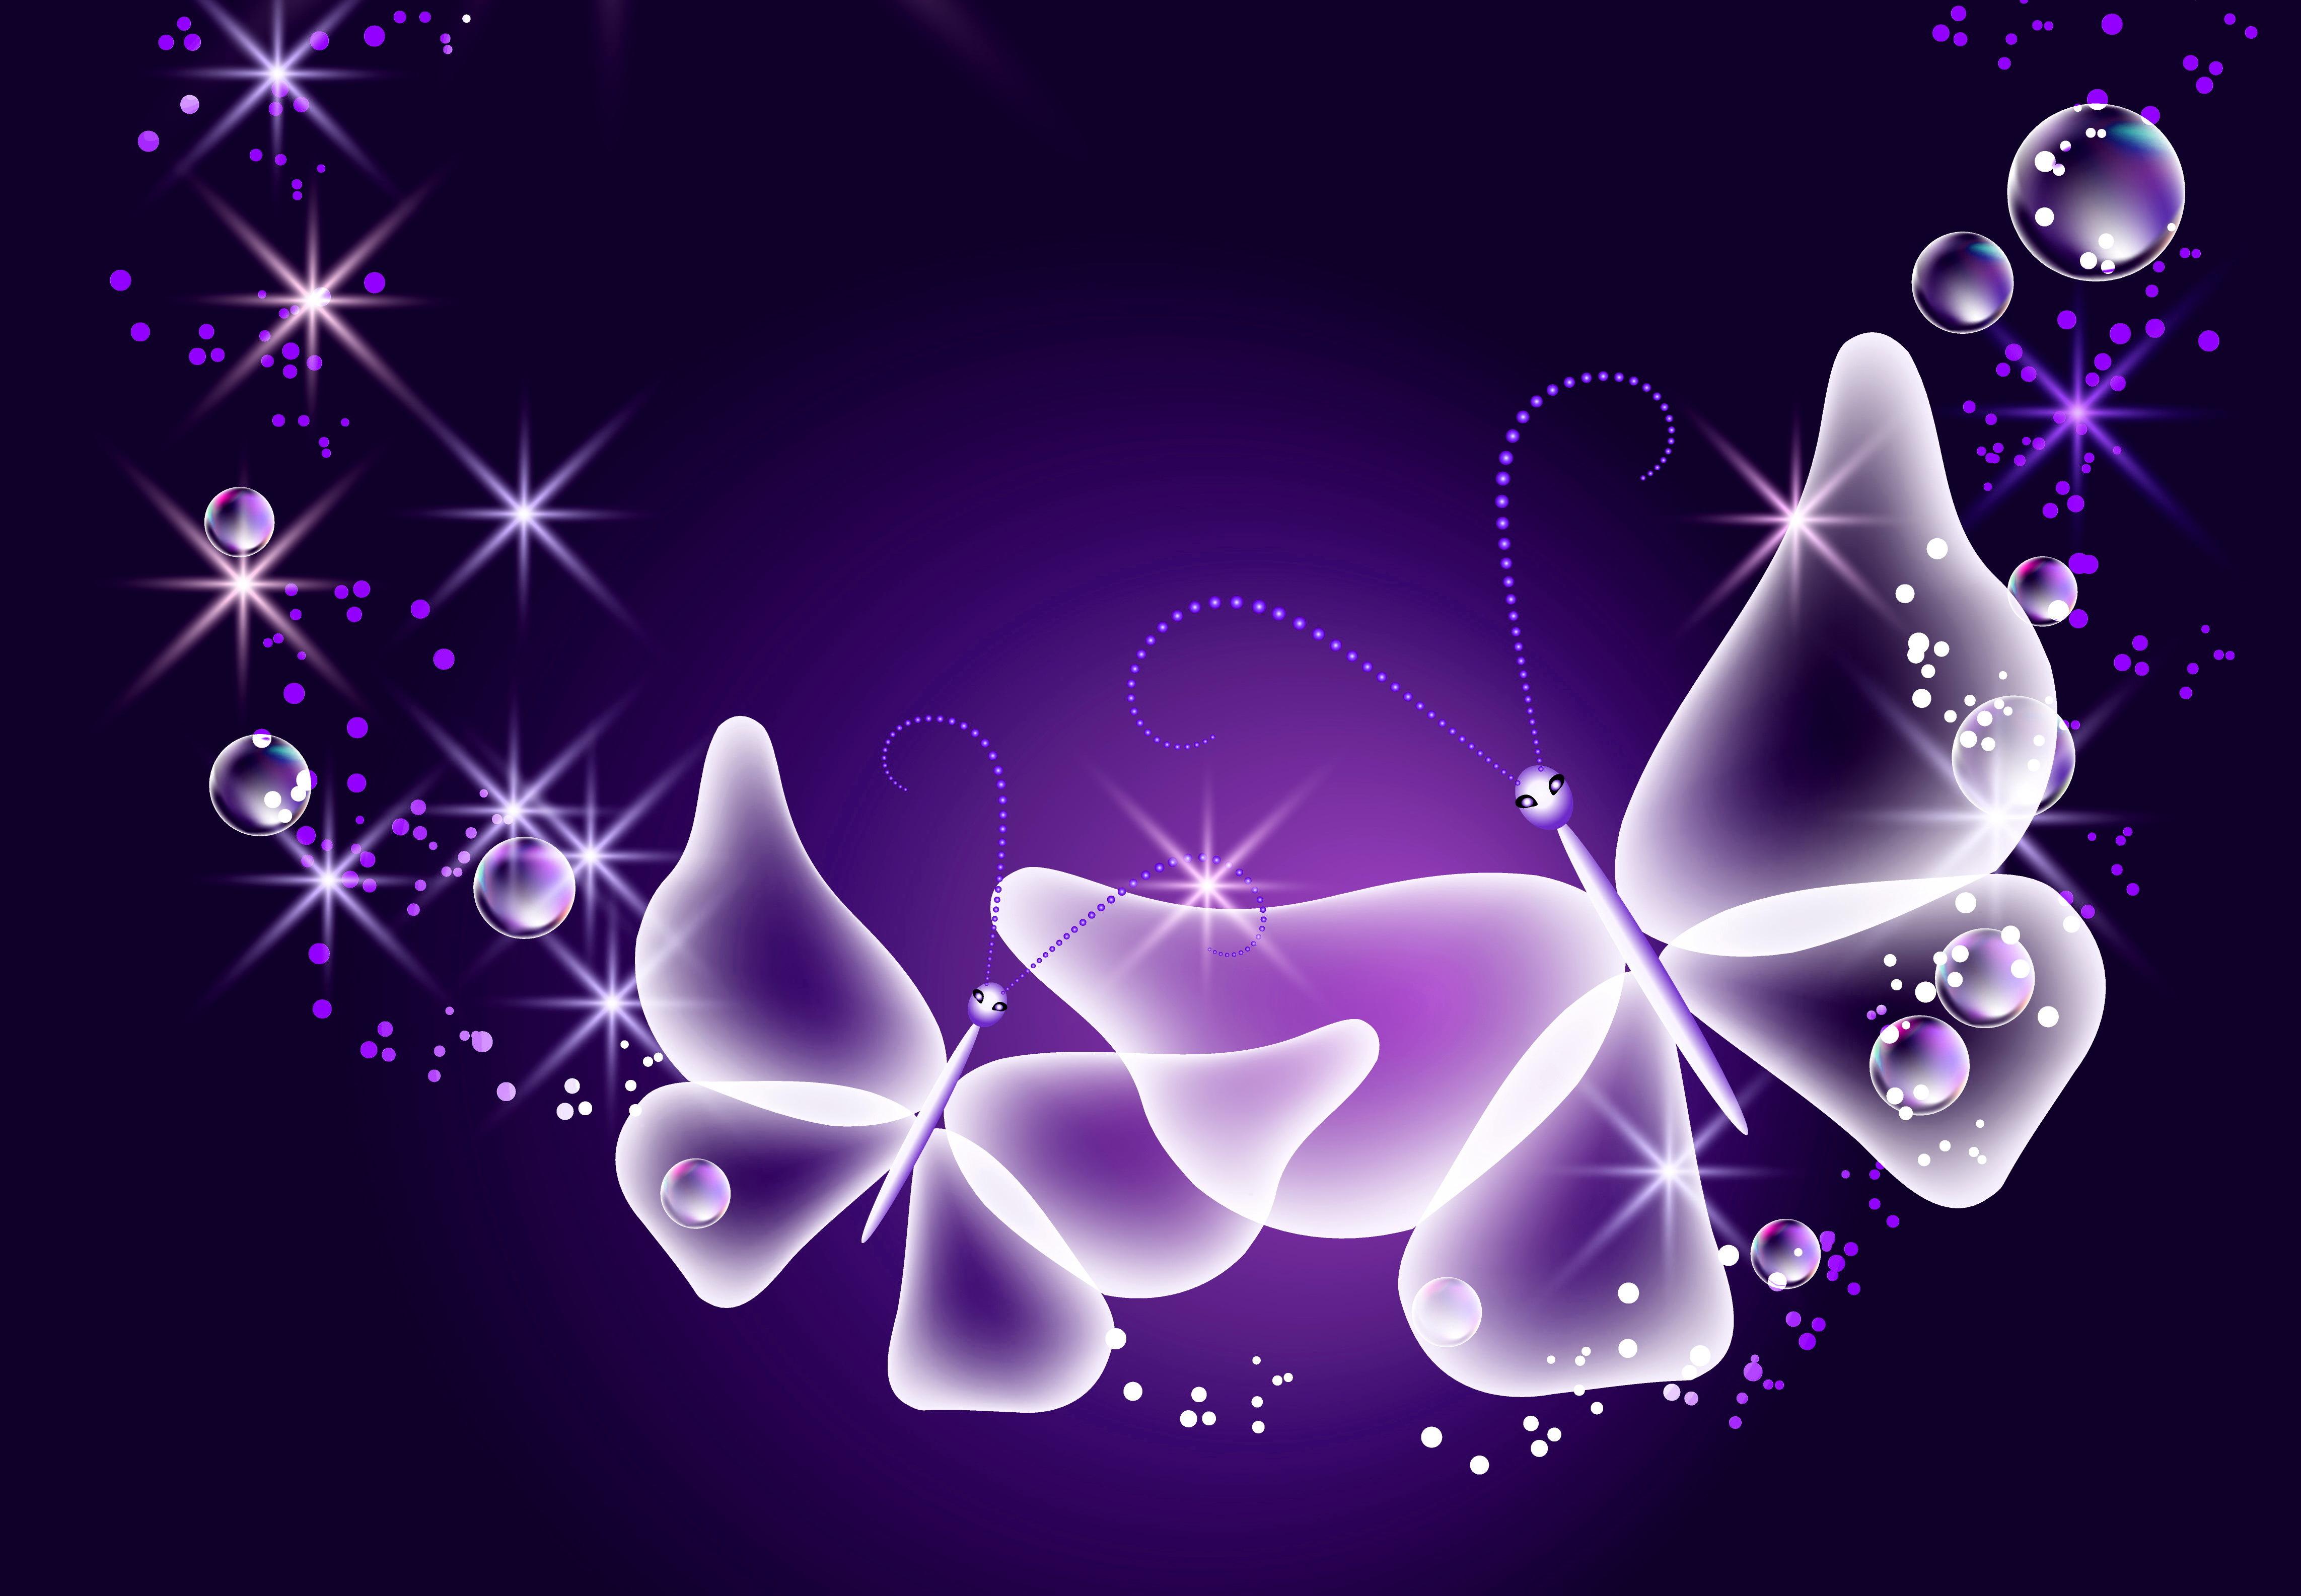 Aninimal Book: Purple Butterfly Desktop Wallpaper - WallpaperSafari